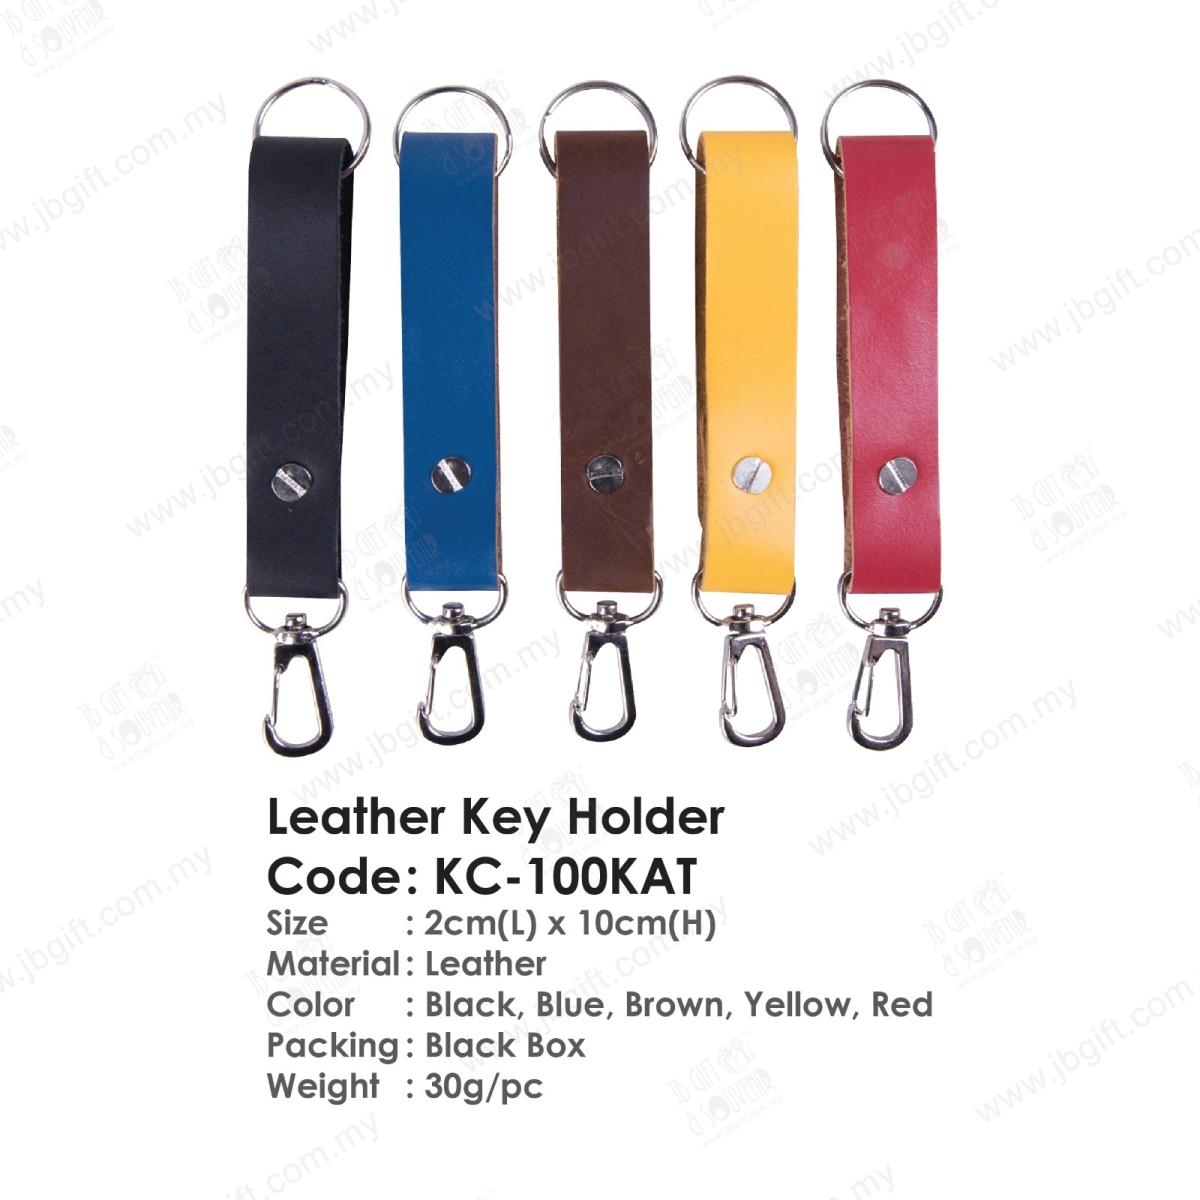 Leather Key Holder KC-100KAT Key Chain Johor Bahru (JB), Malaysia Supplier, Suppliers, Supply, Supplies   JB GIFT & SOUVENIR (M) SDN BHD